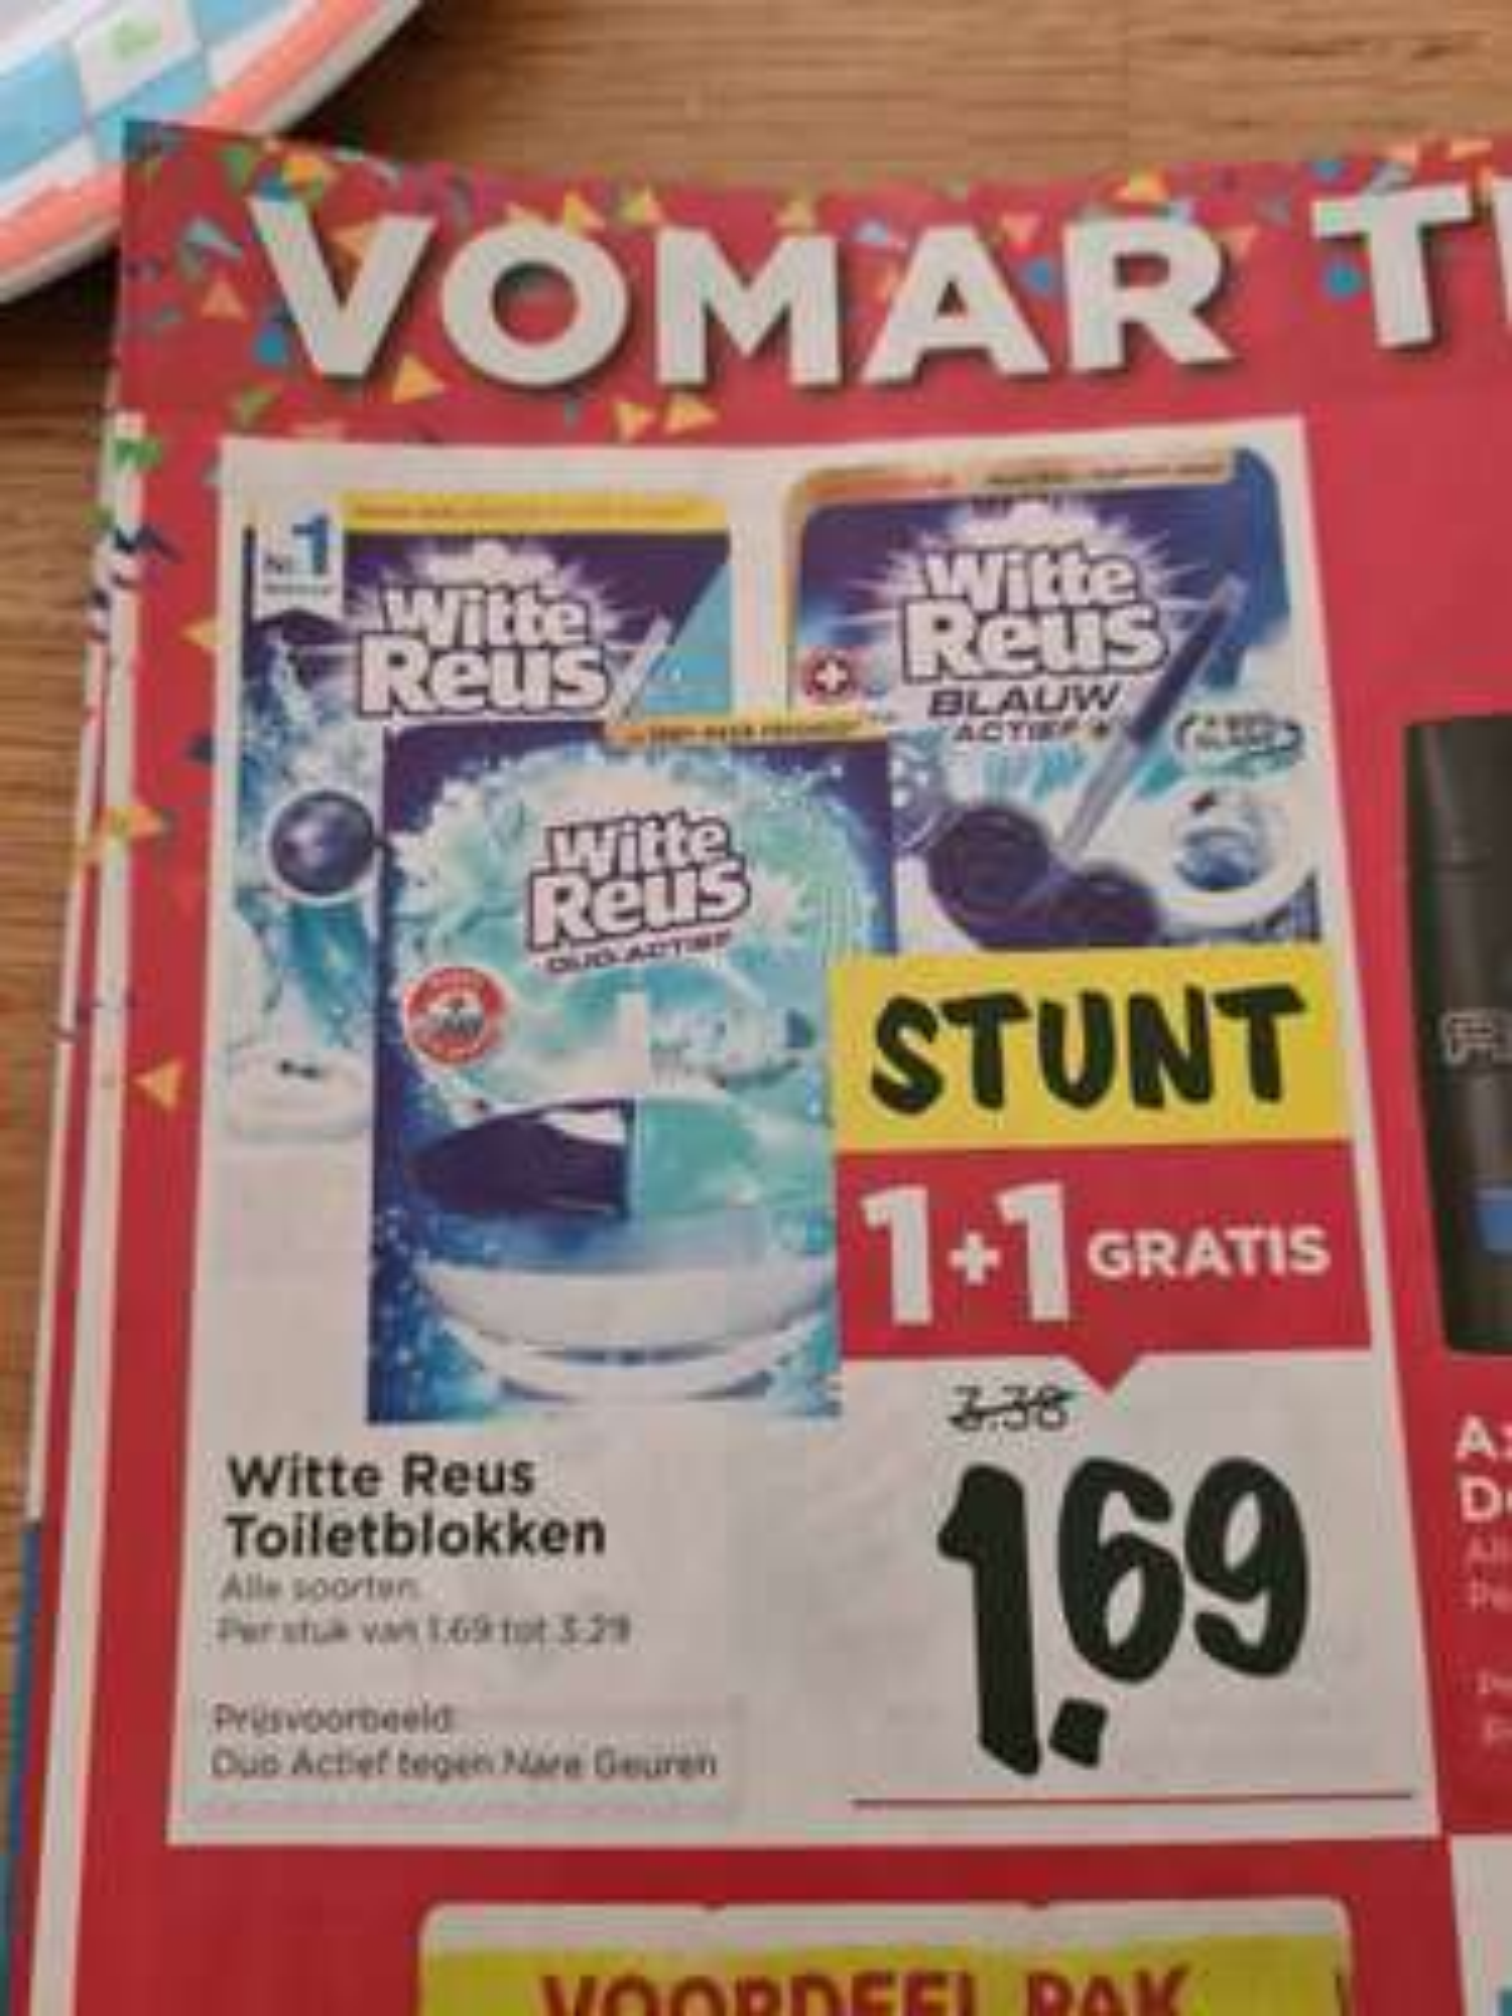 Vomar 26 juli t/m 1 augustus witte reus wc blok 1 + 1 gratis